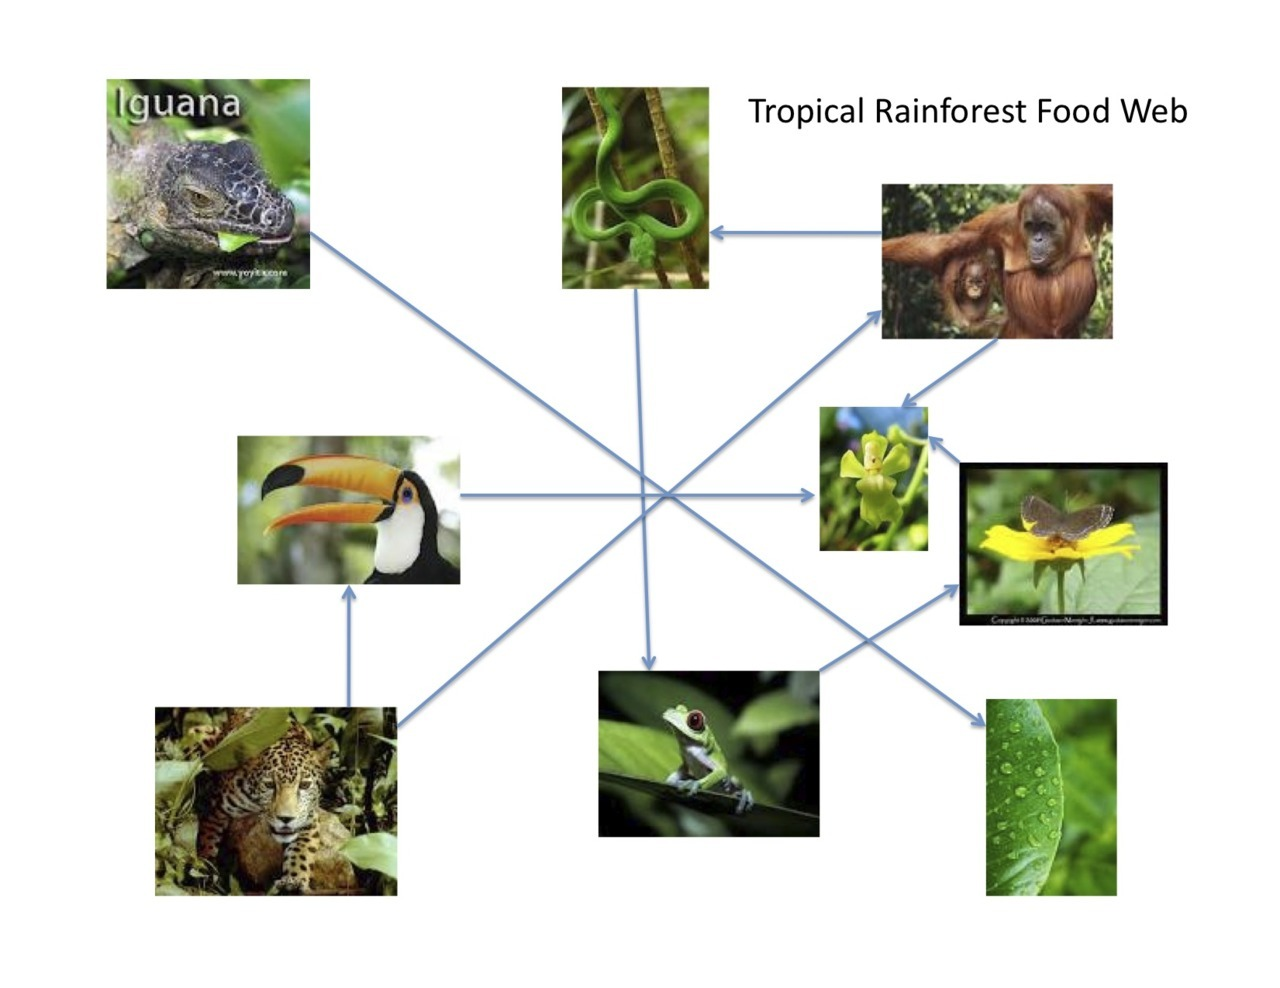 Tropical Rainforest Food Web For Tropical Rainforest